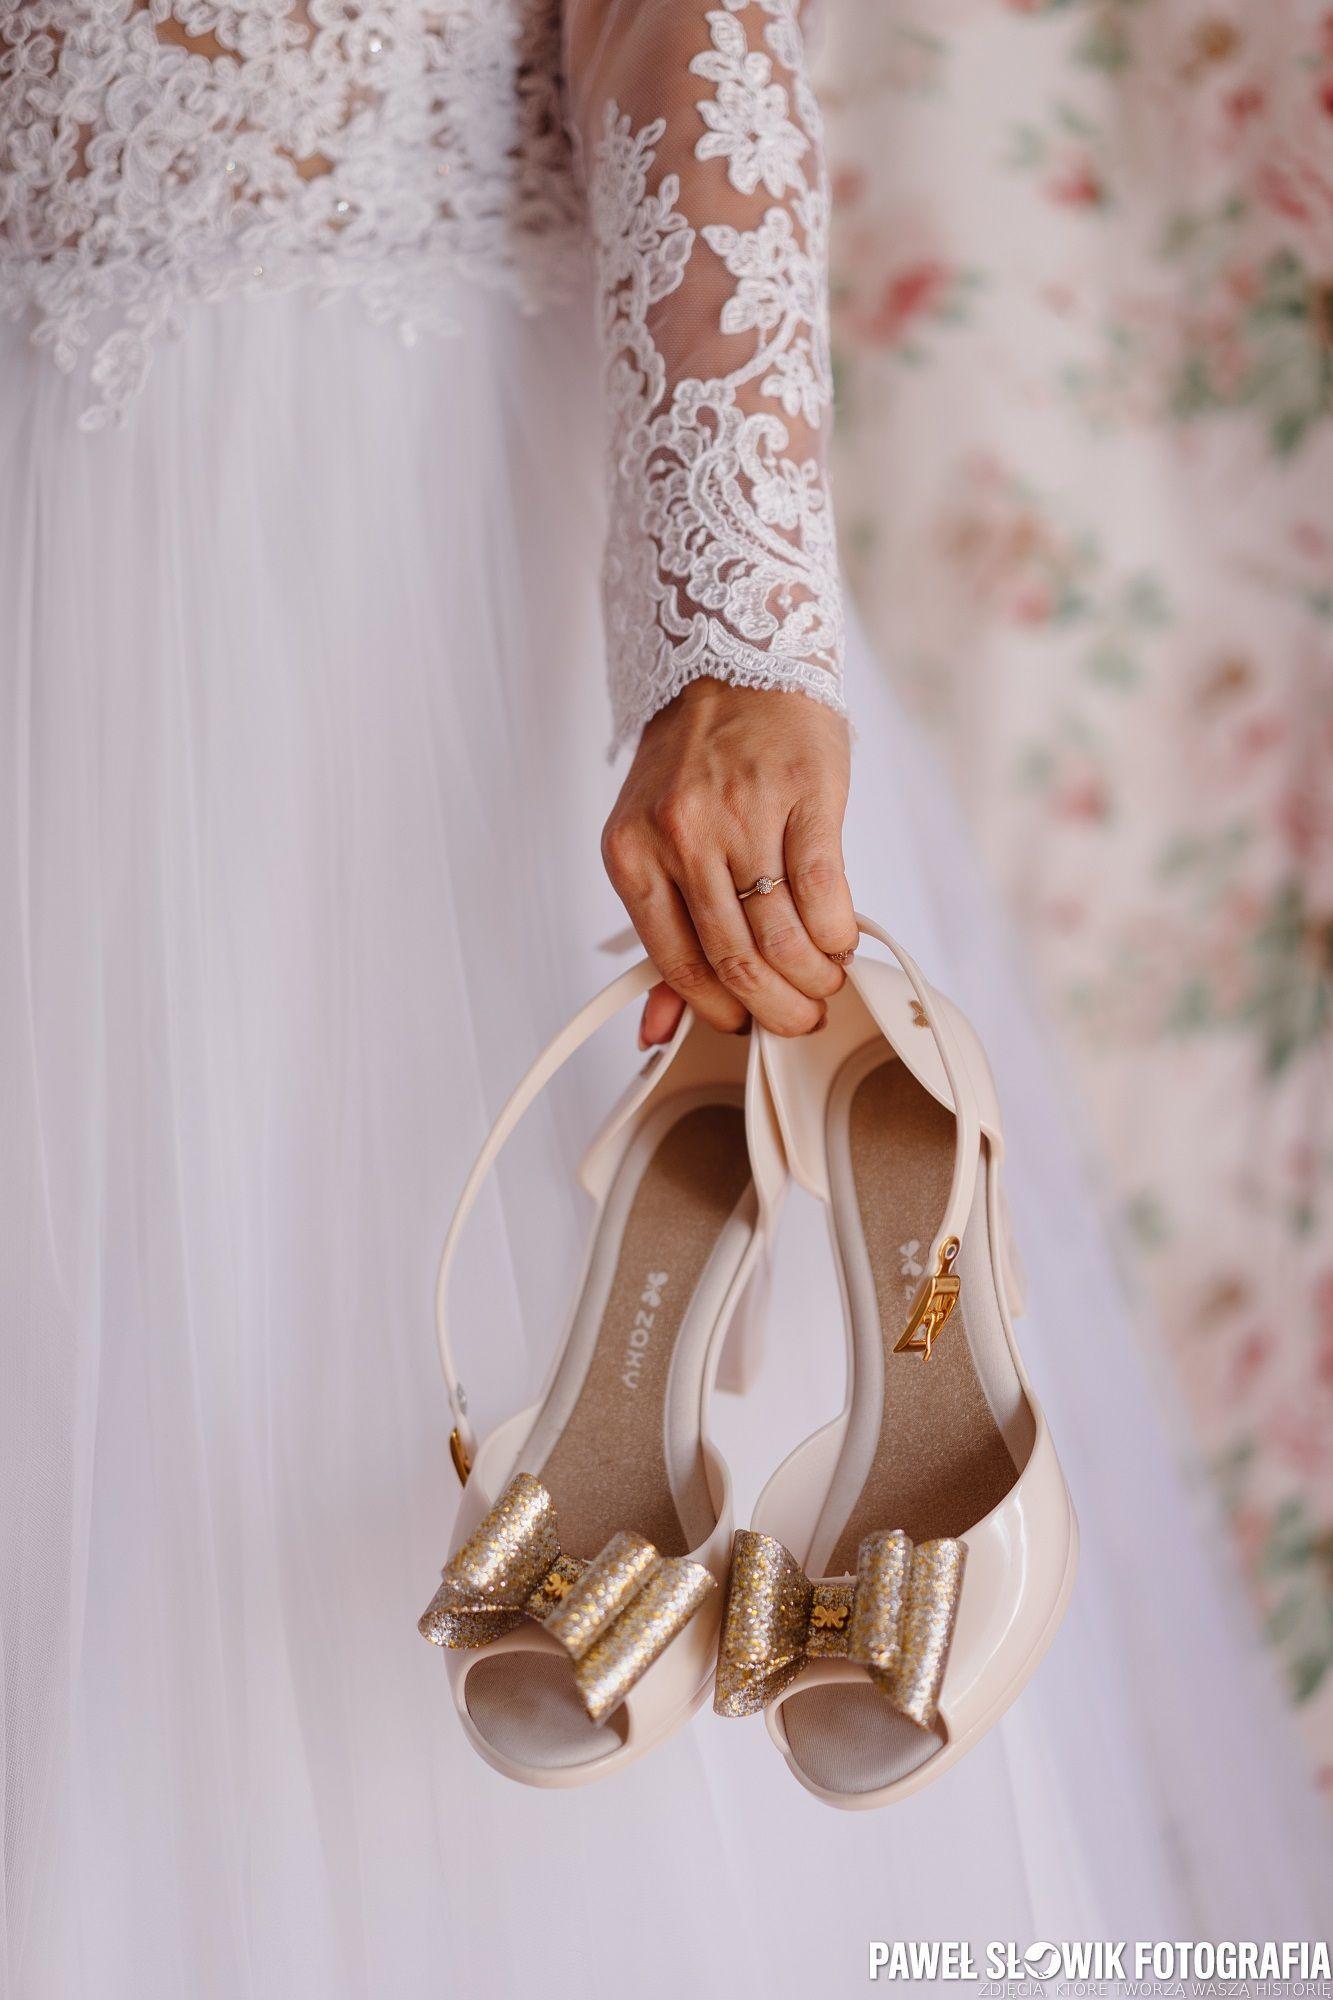 Pin By Pawel Slowik On Zdjecia Slubne Pomysly Wedding Shoe Shoes Wedding